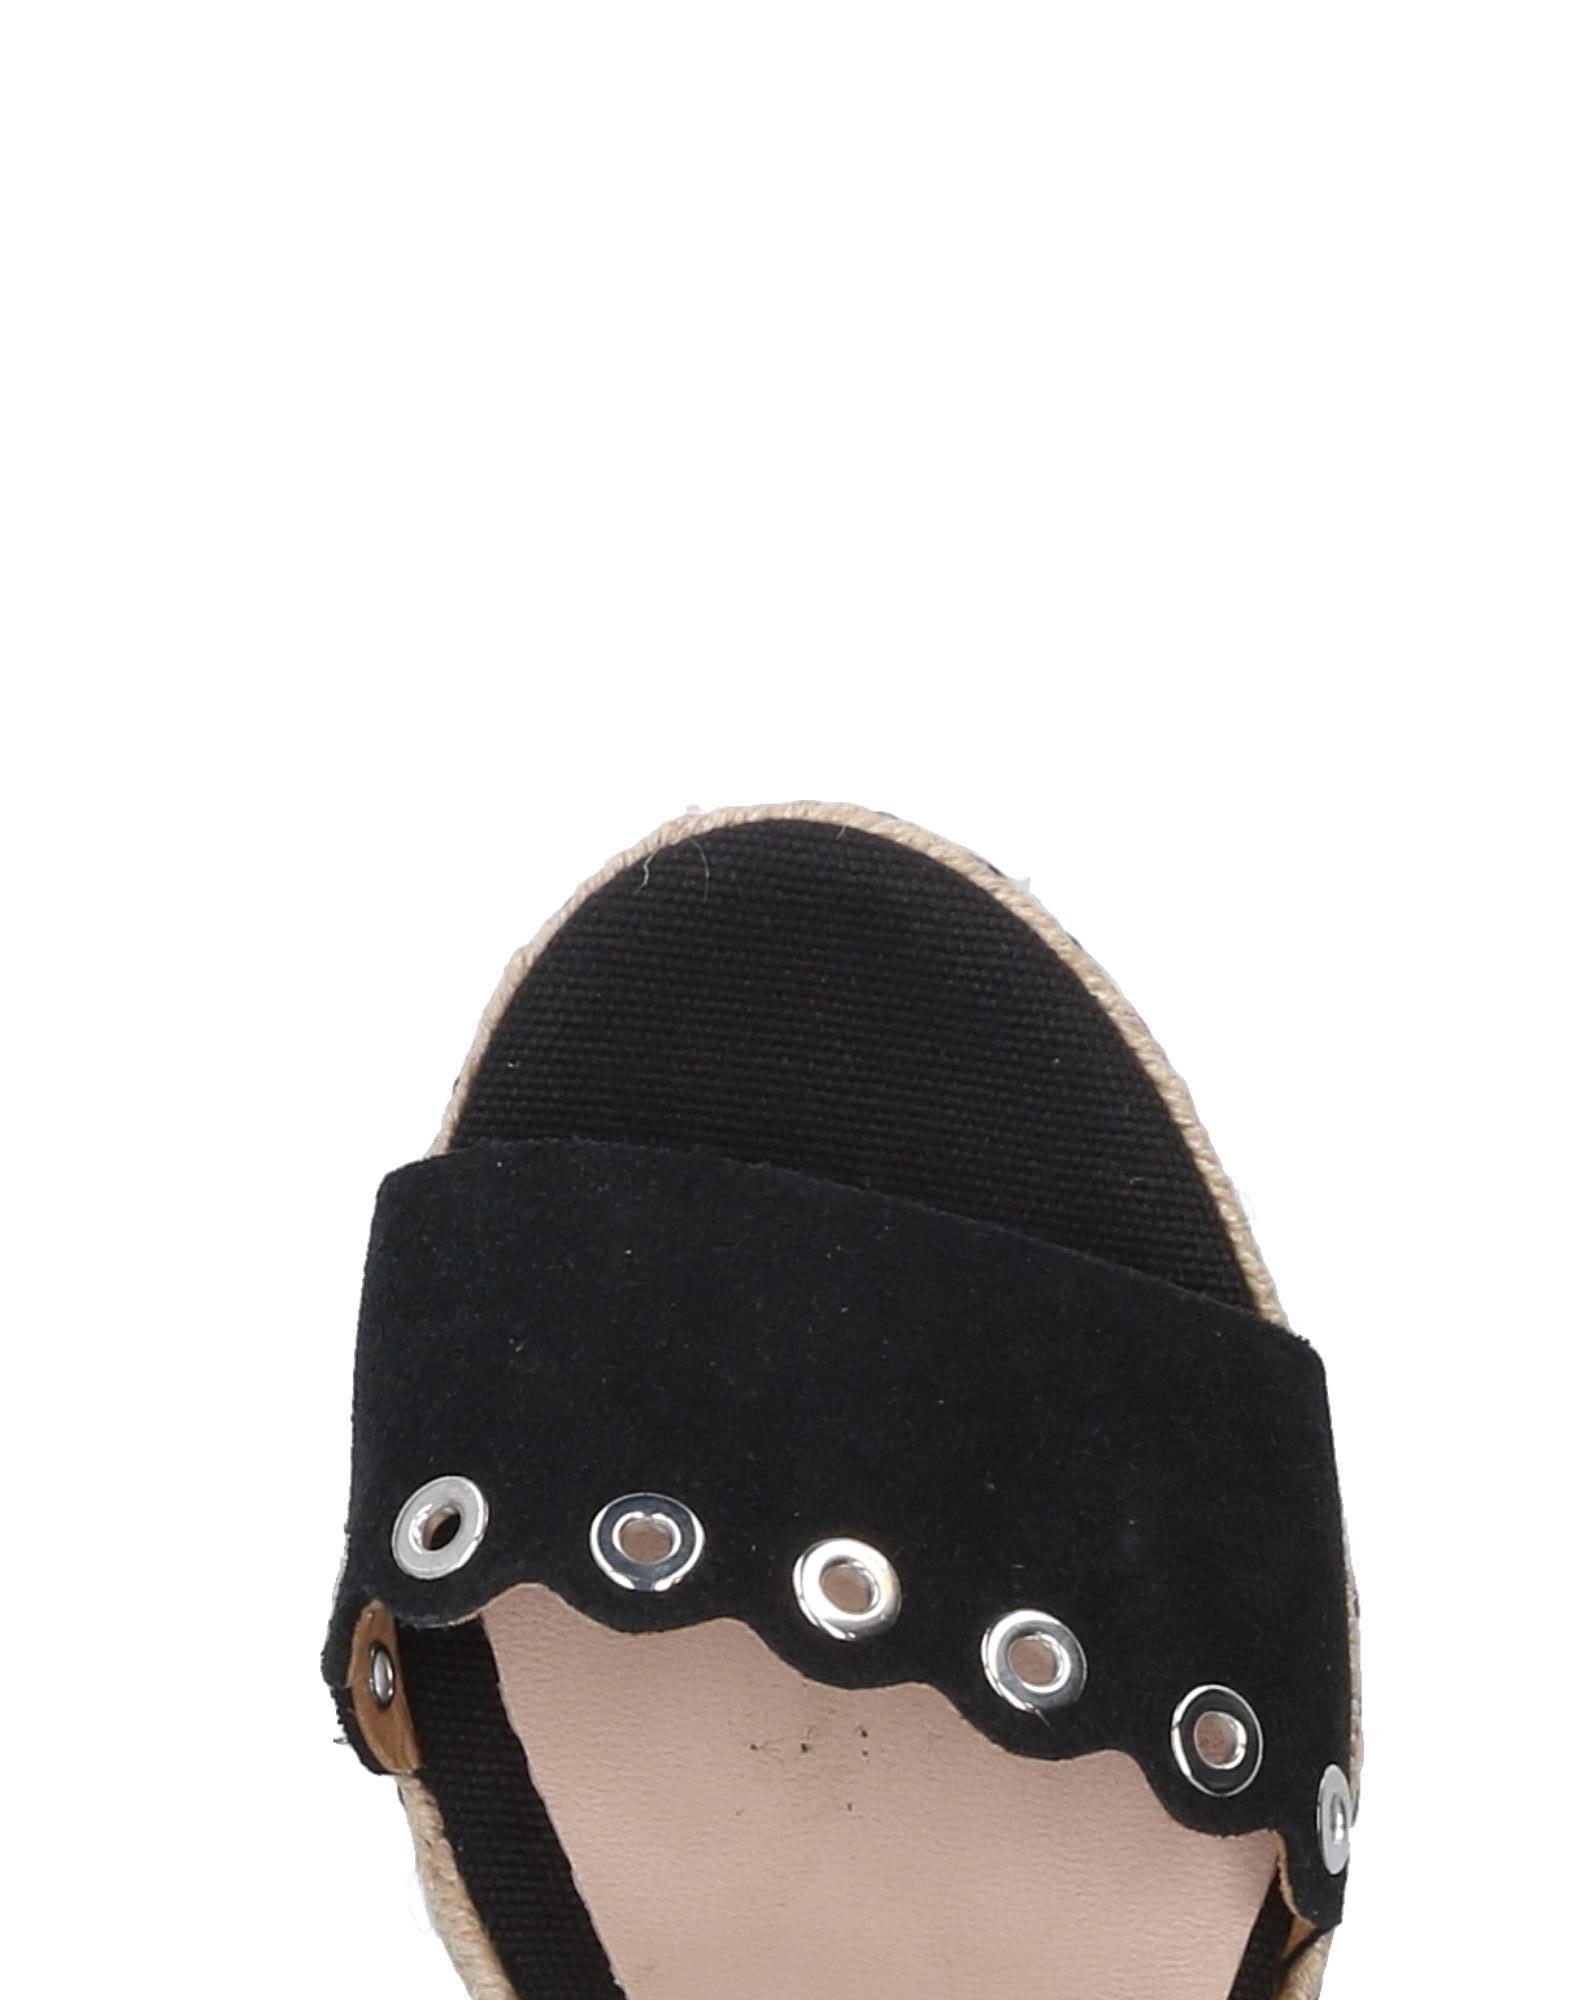 Soher Sandalen Damen  11460523LM Schuhe Gute Qualität beliebte Schuhe 11460523LM cfeec3